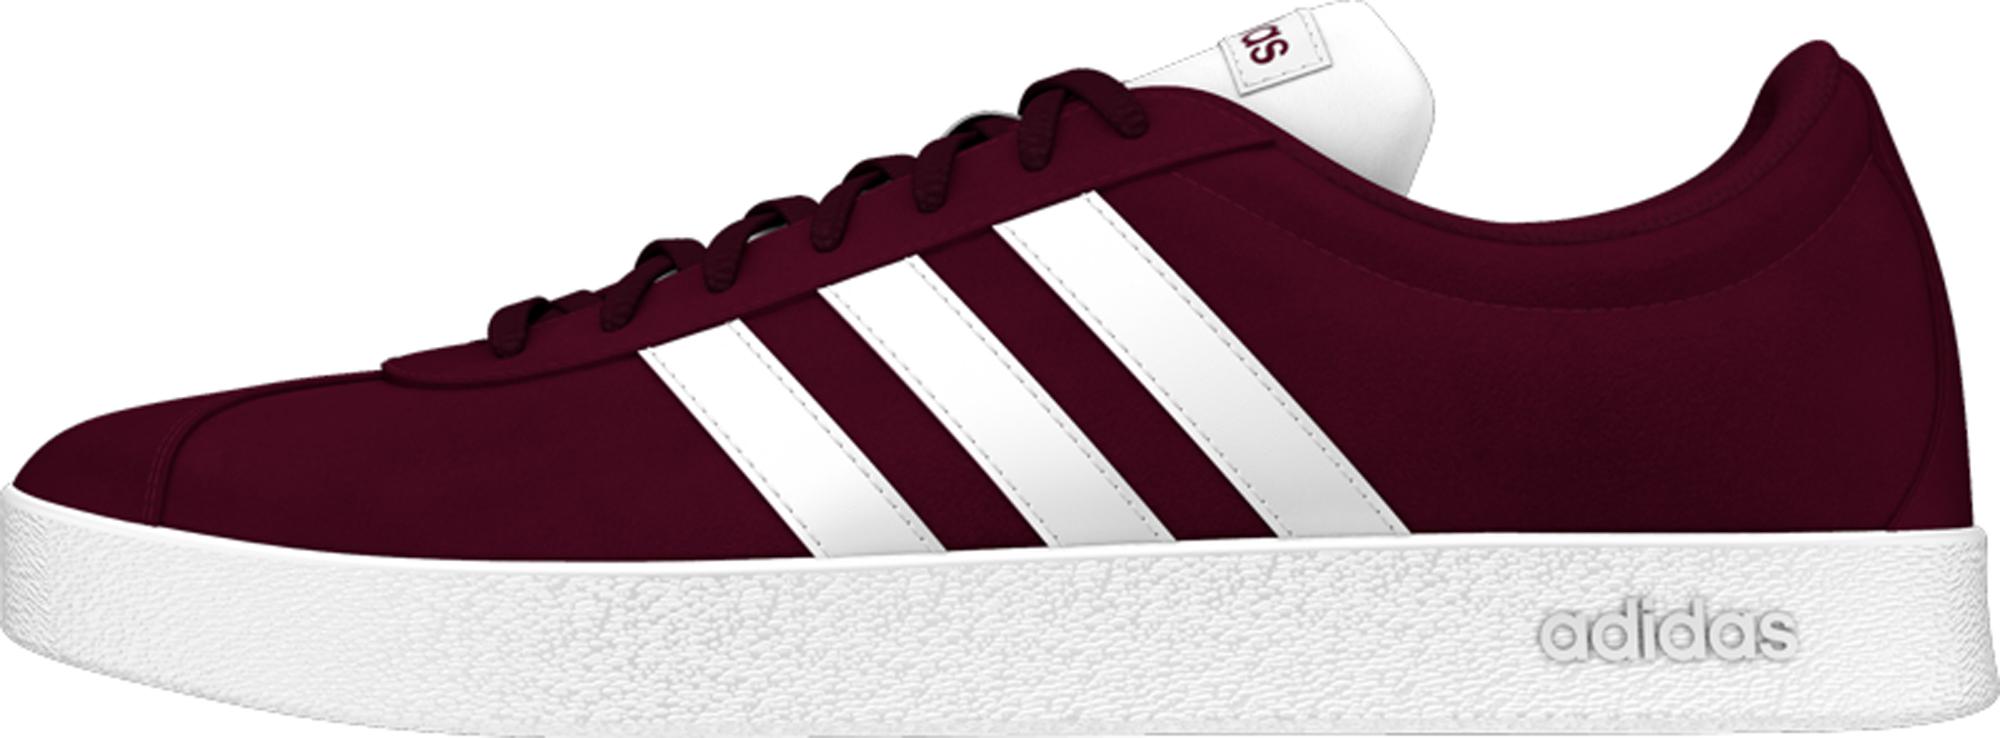 цена на Adidas Кеды мужские Adidas Vl Court 2.0, размер 43